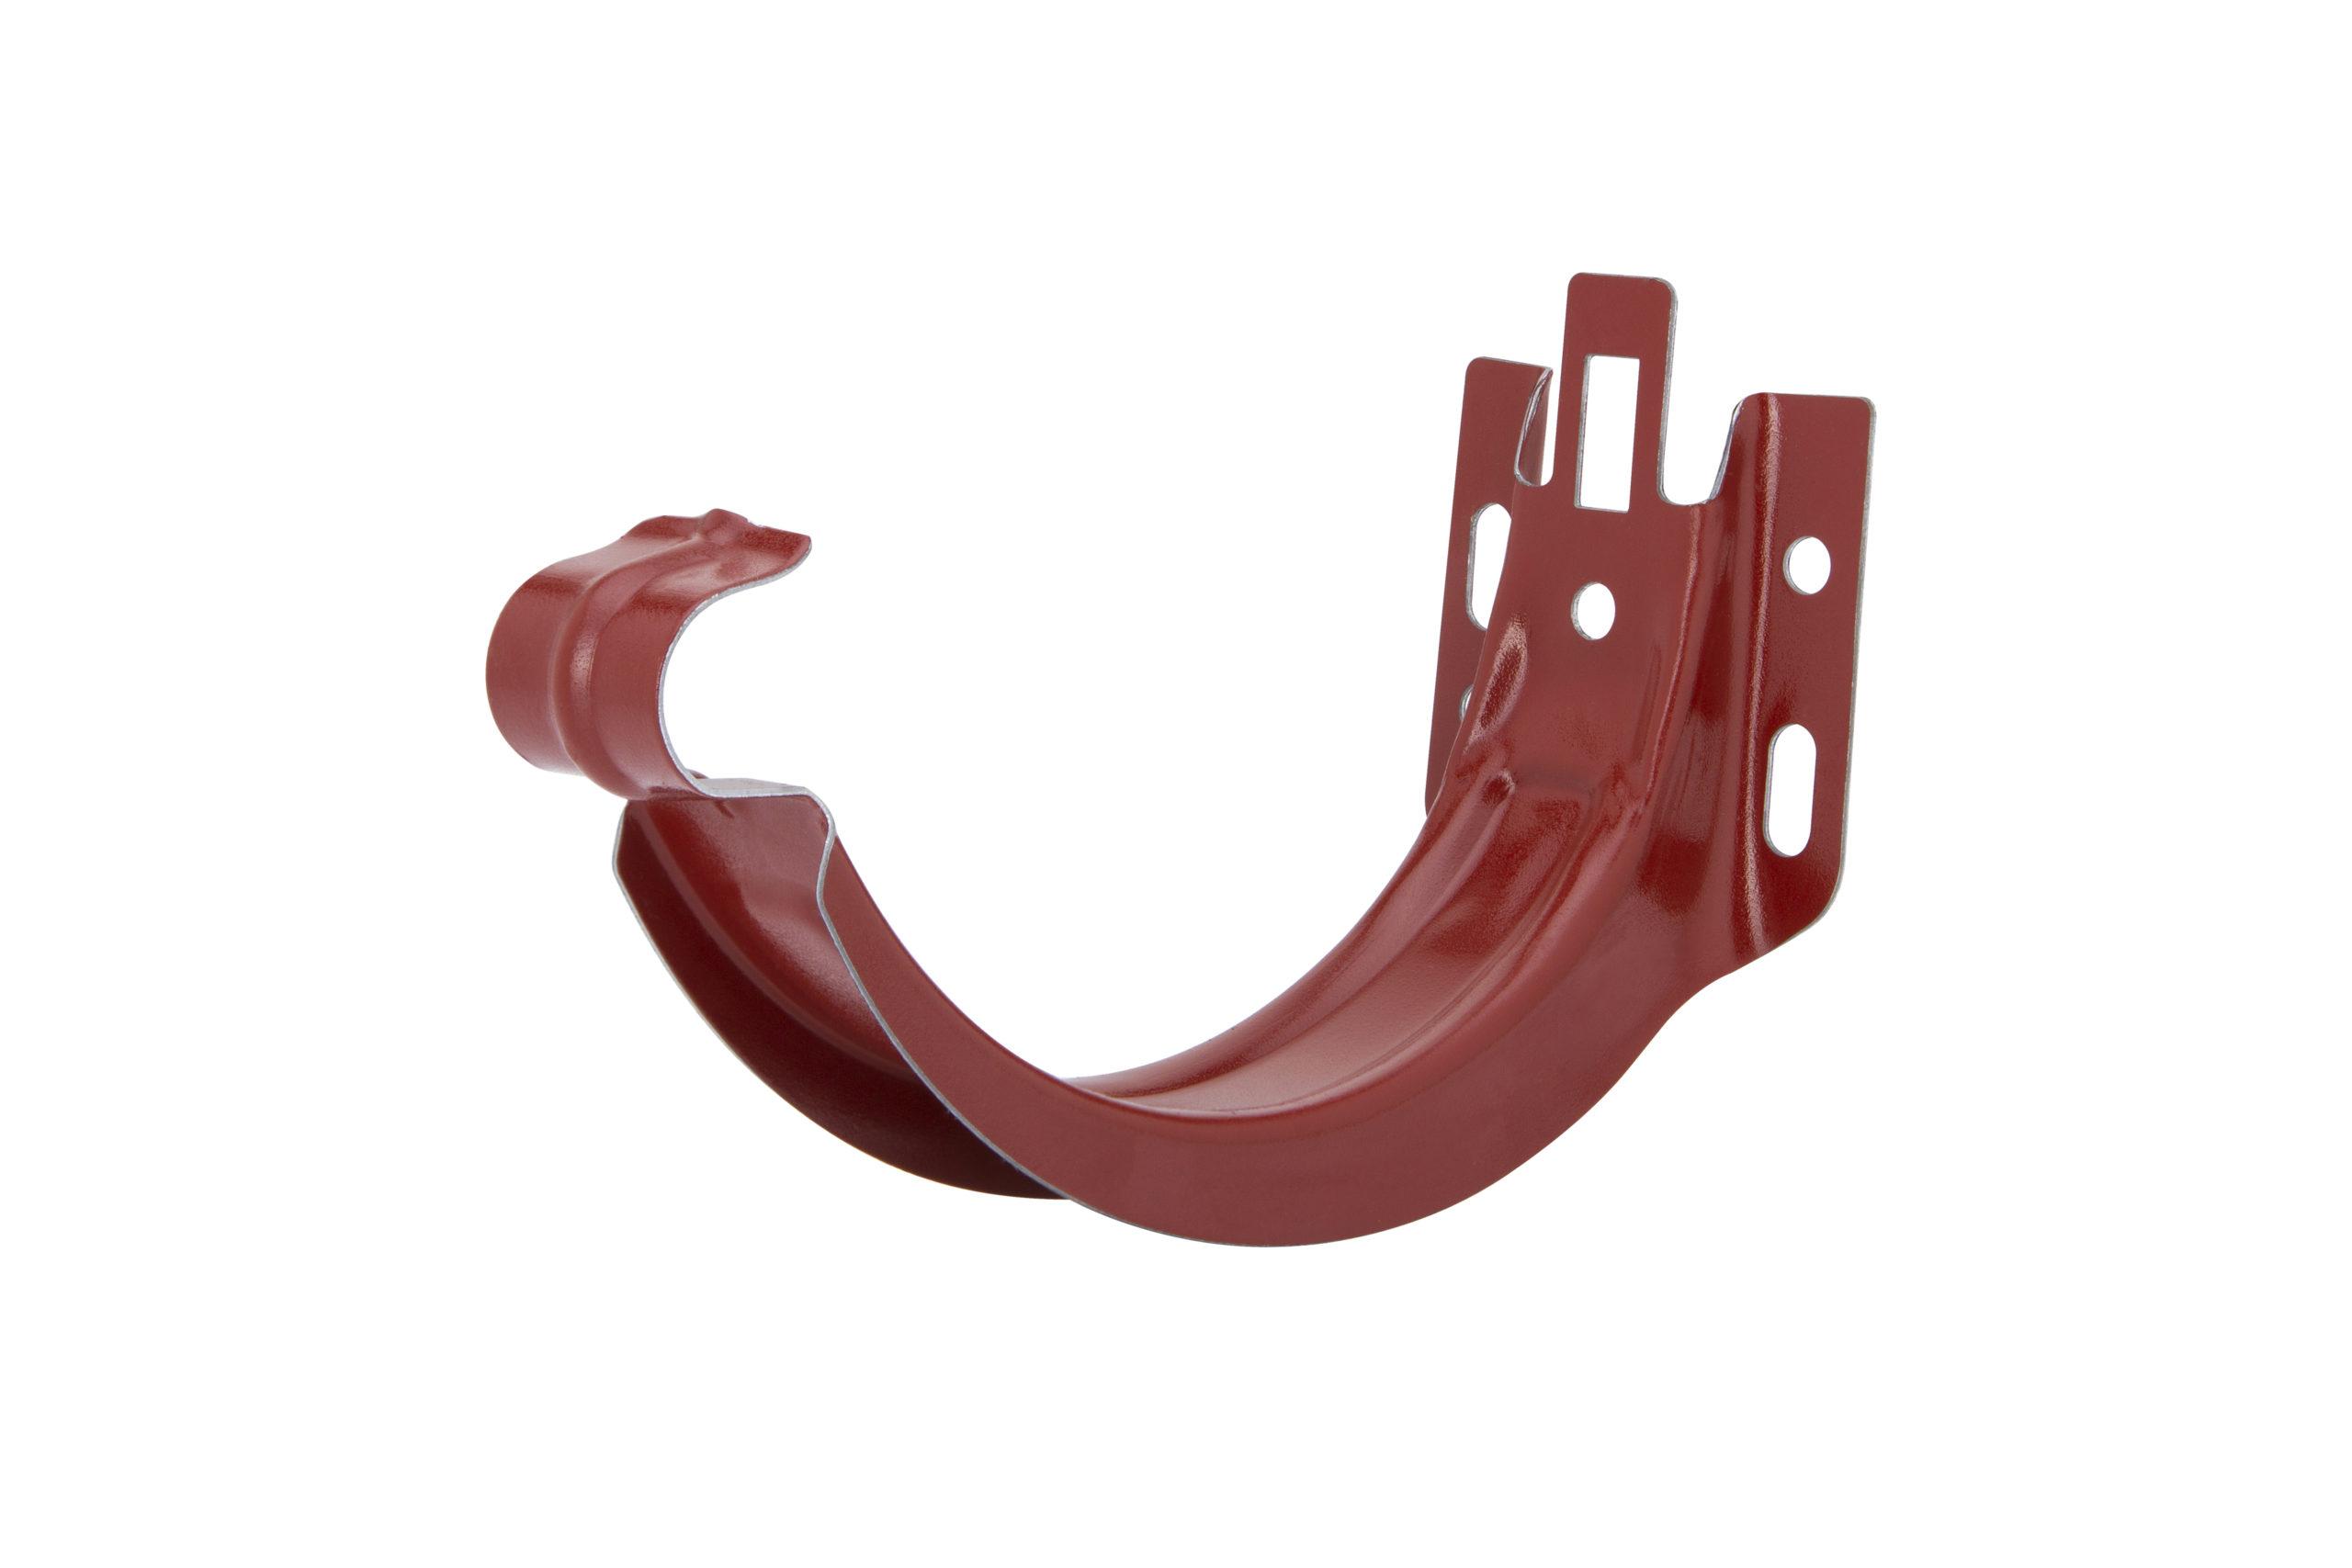 Тримач ринви металевий на лобову дошку, темно-червоний Aqueduct